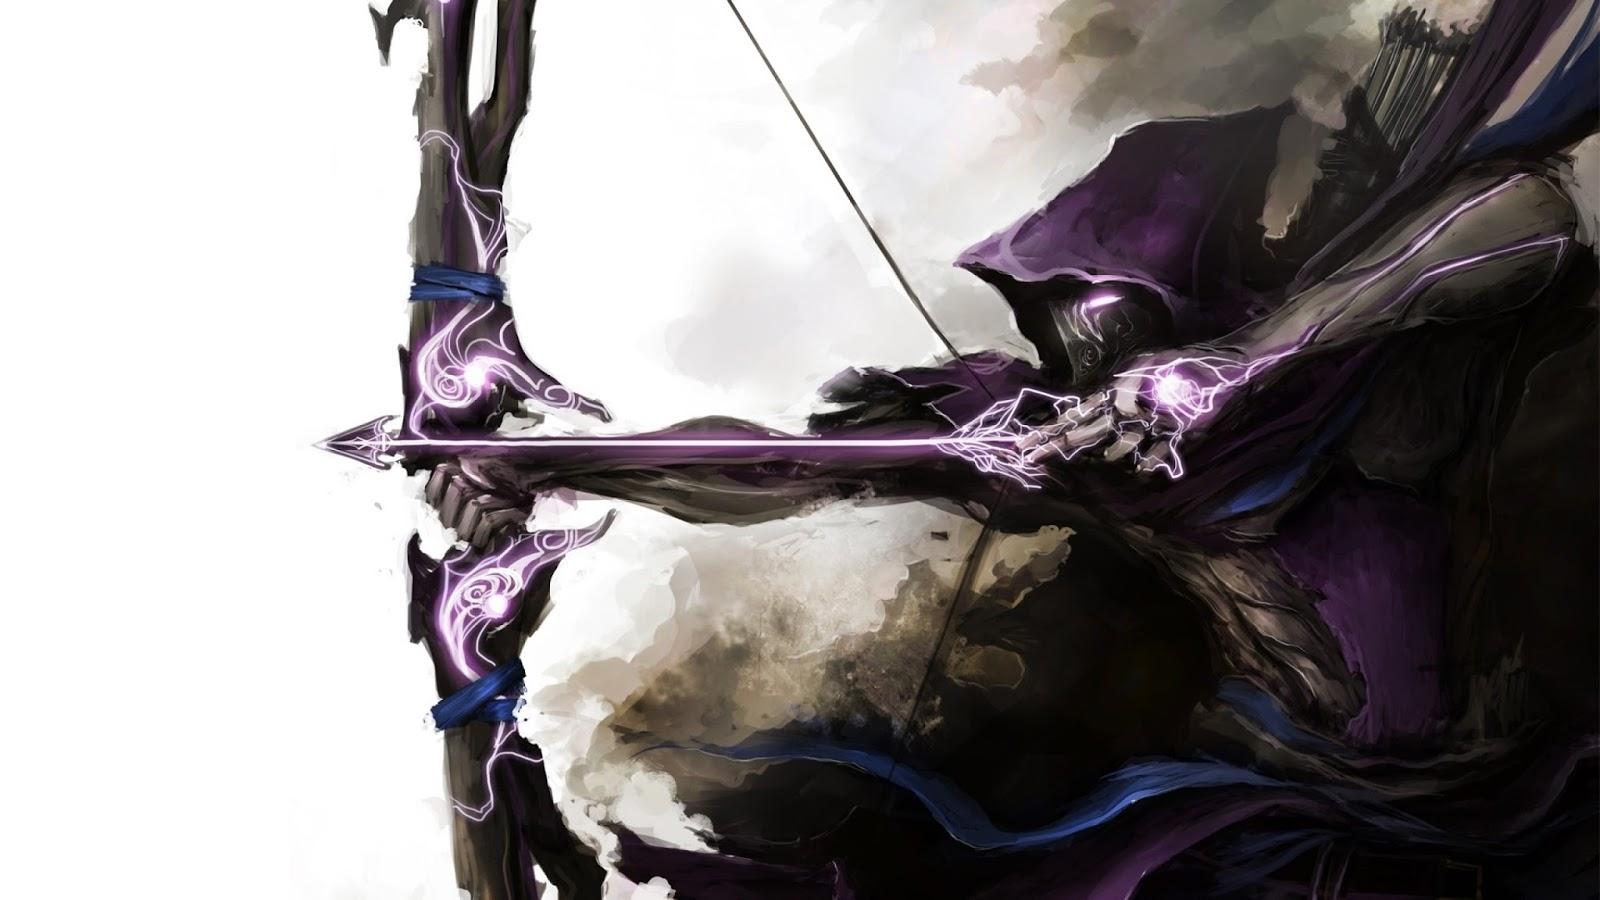 hawkeye arrows marvel bow weapon thedurrrrian deviant art HD Wallpaper 1600x900